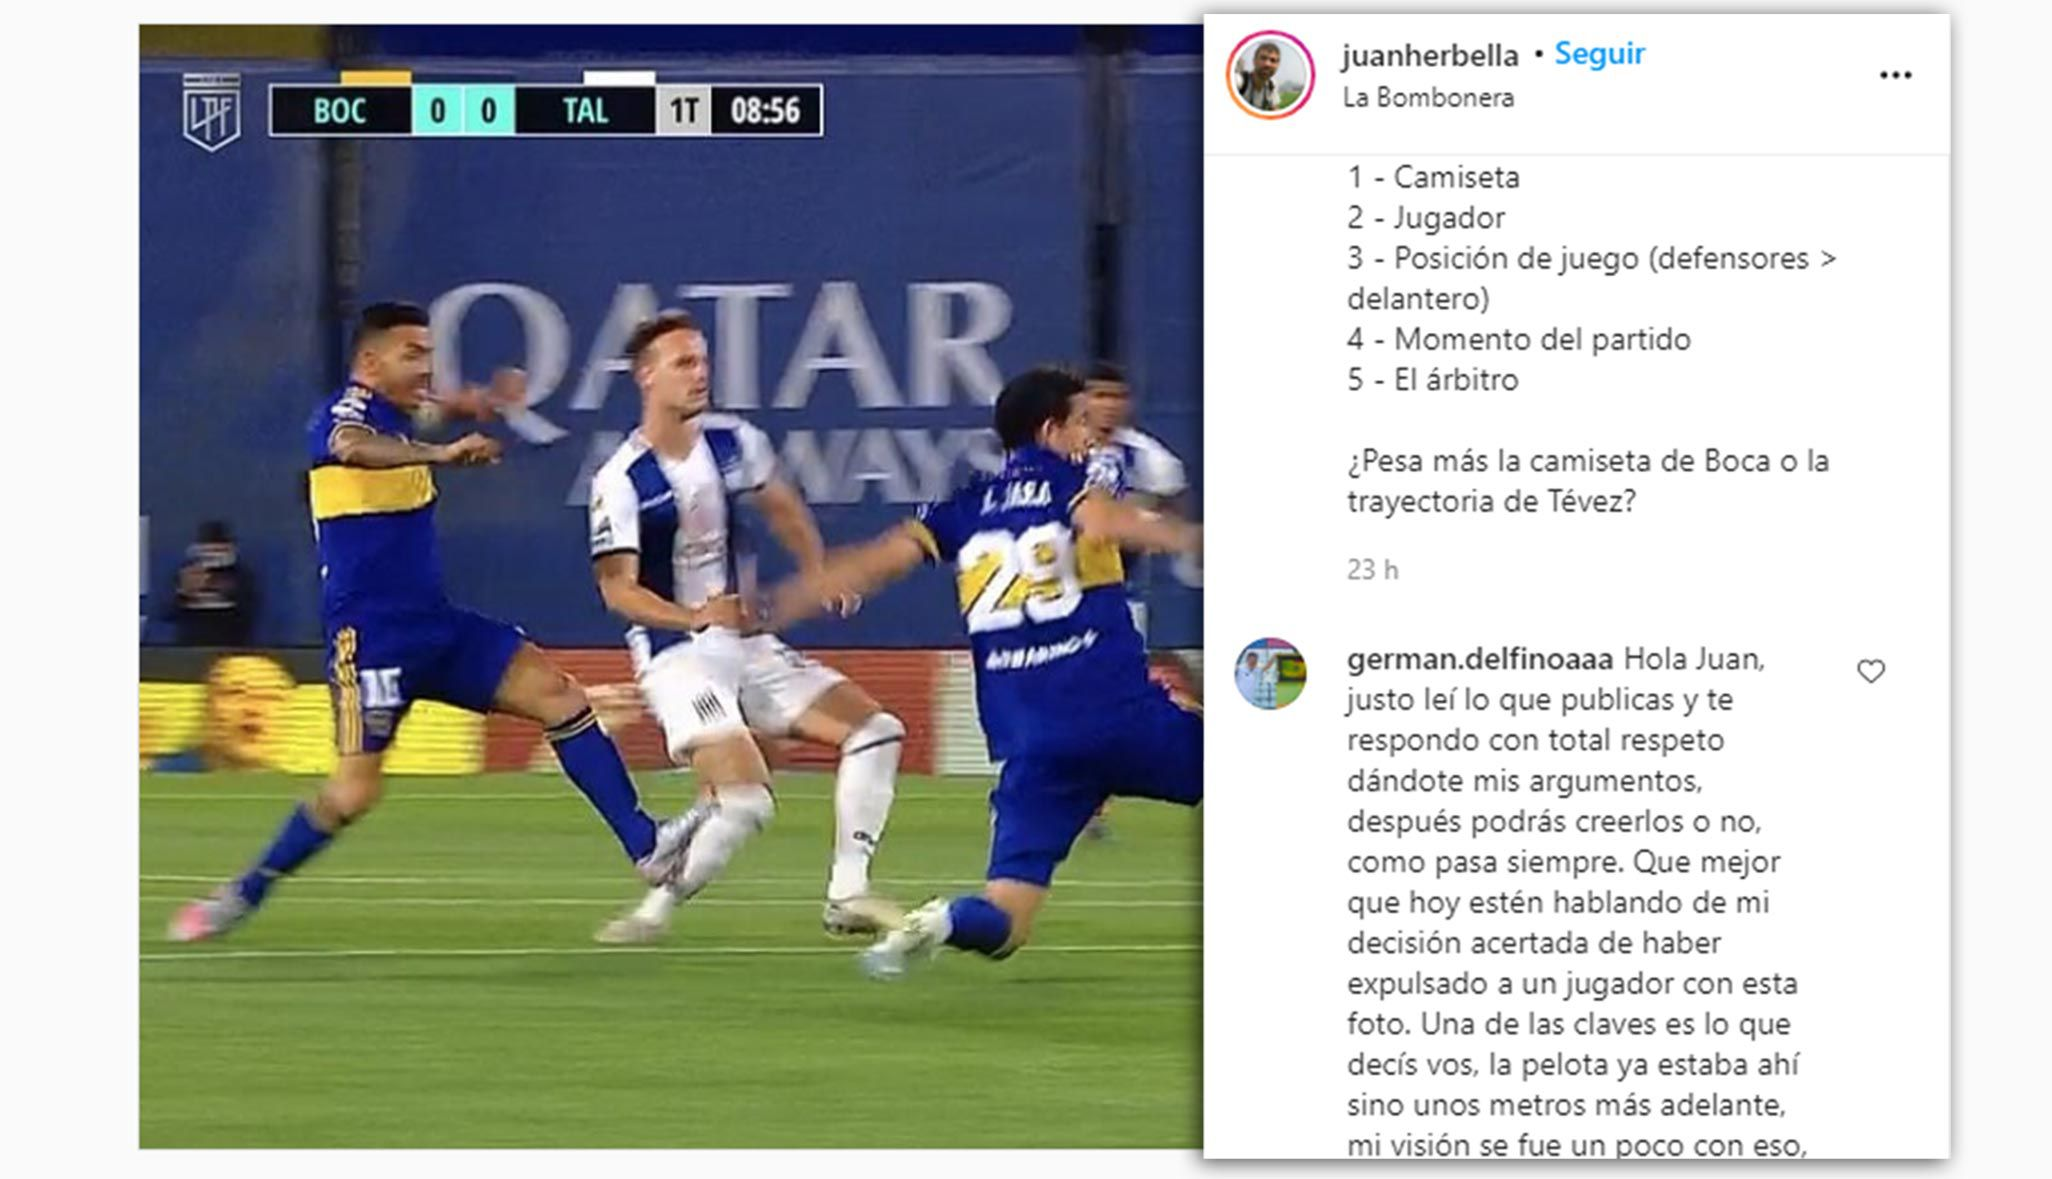 Juan herbella - tevez - delfino 1920 sf  captura instagram